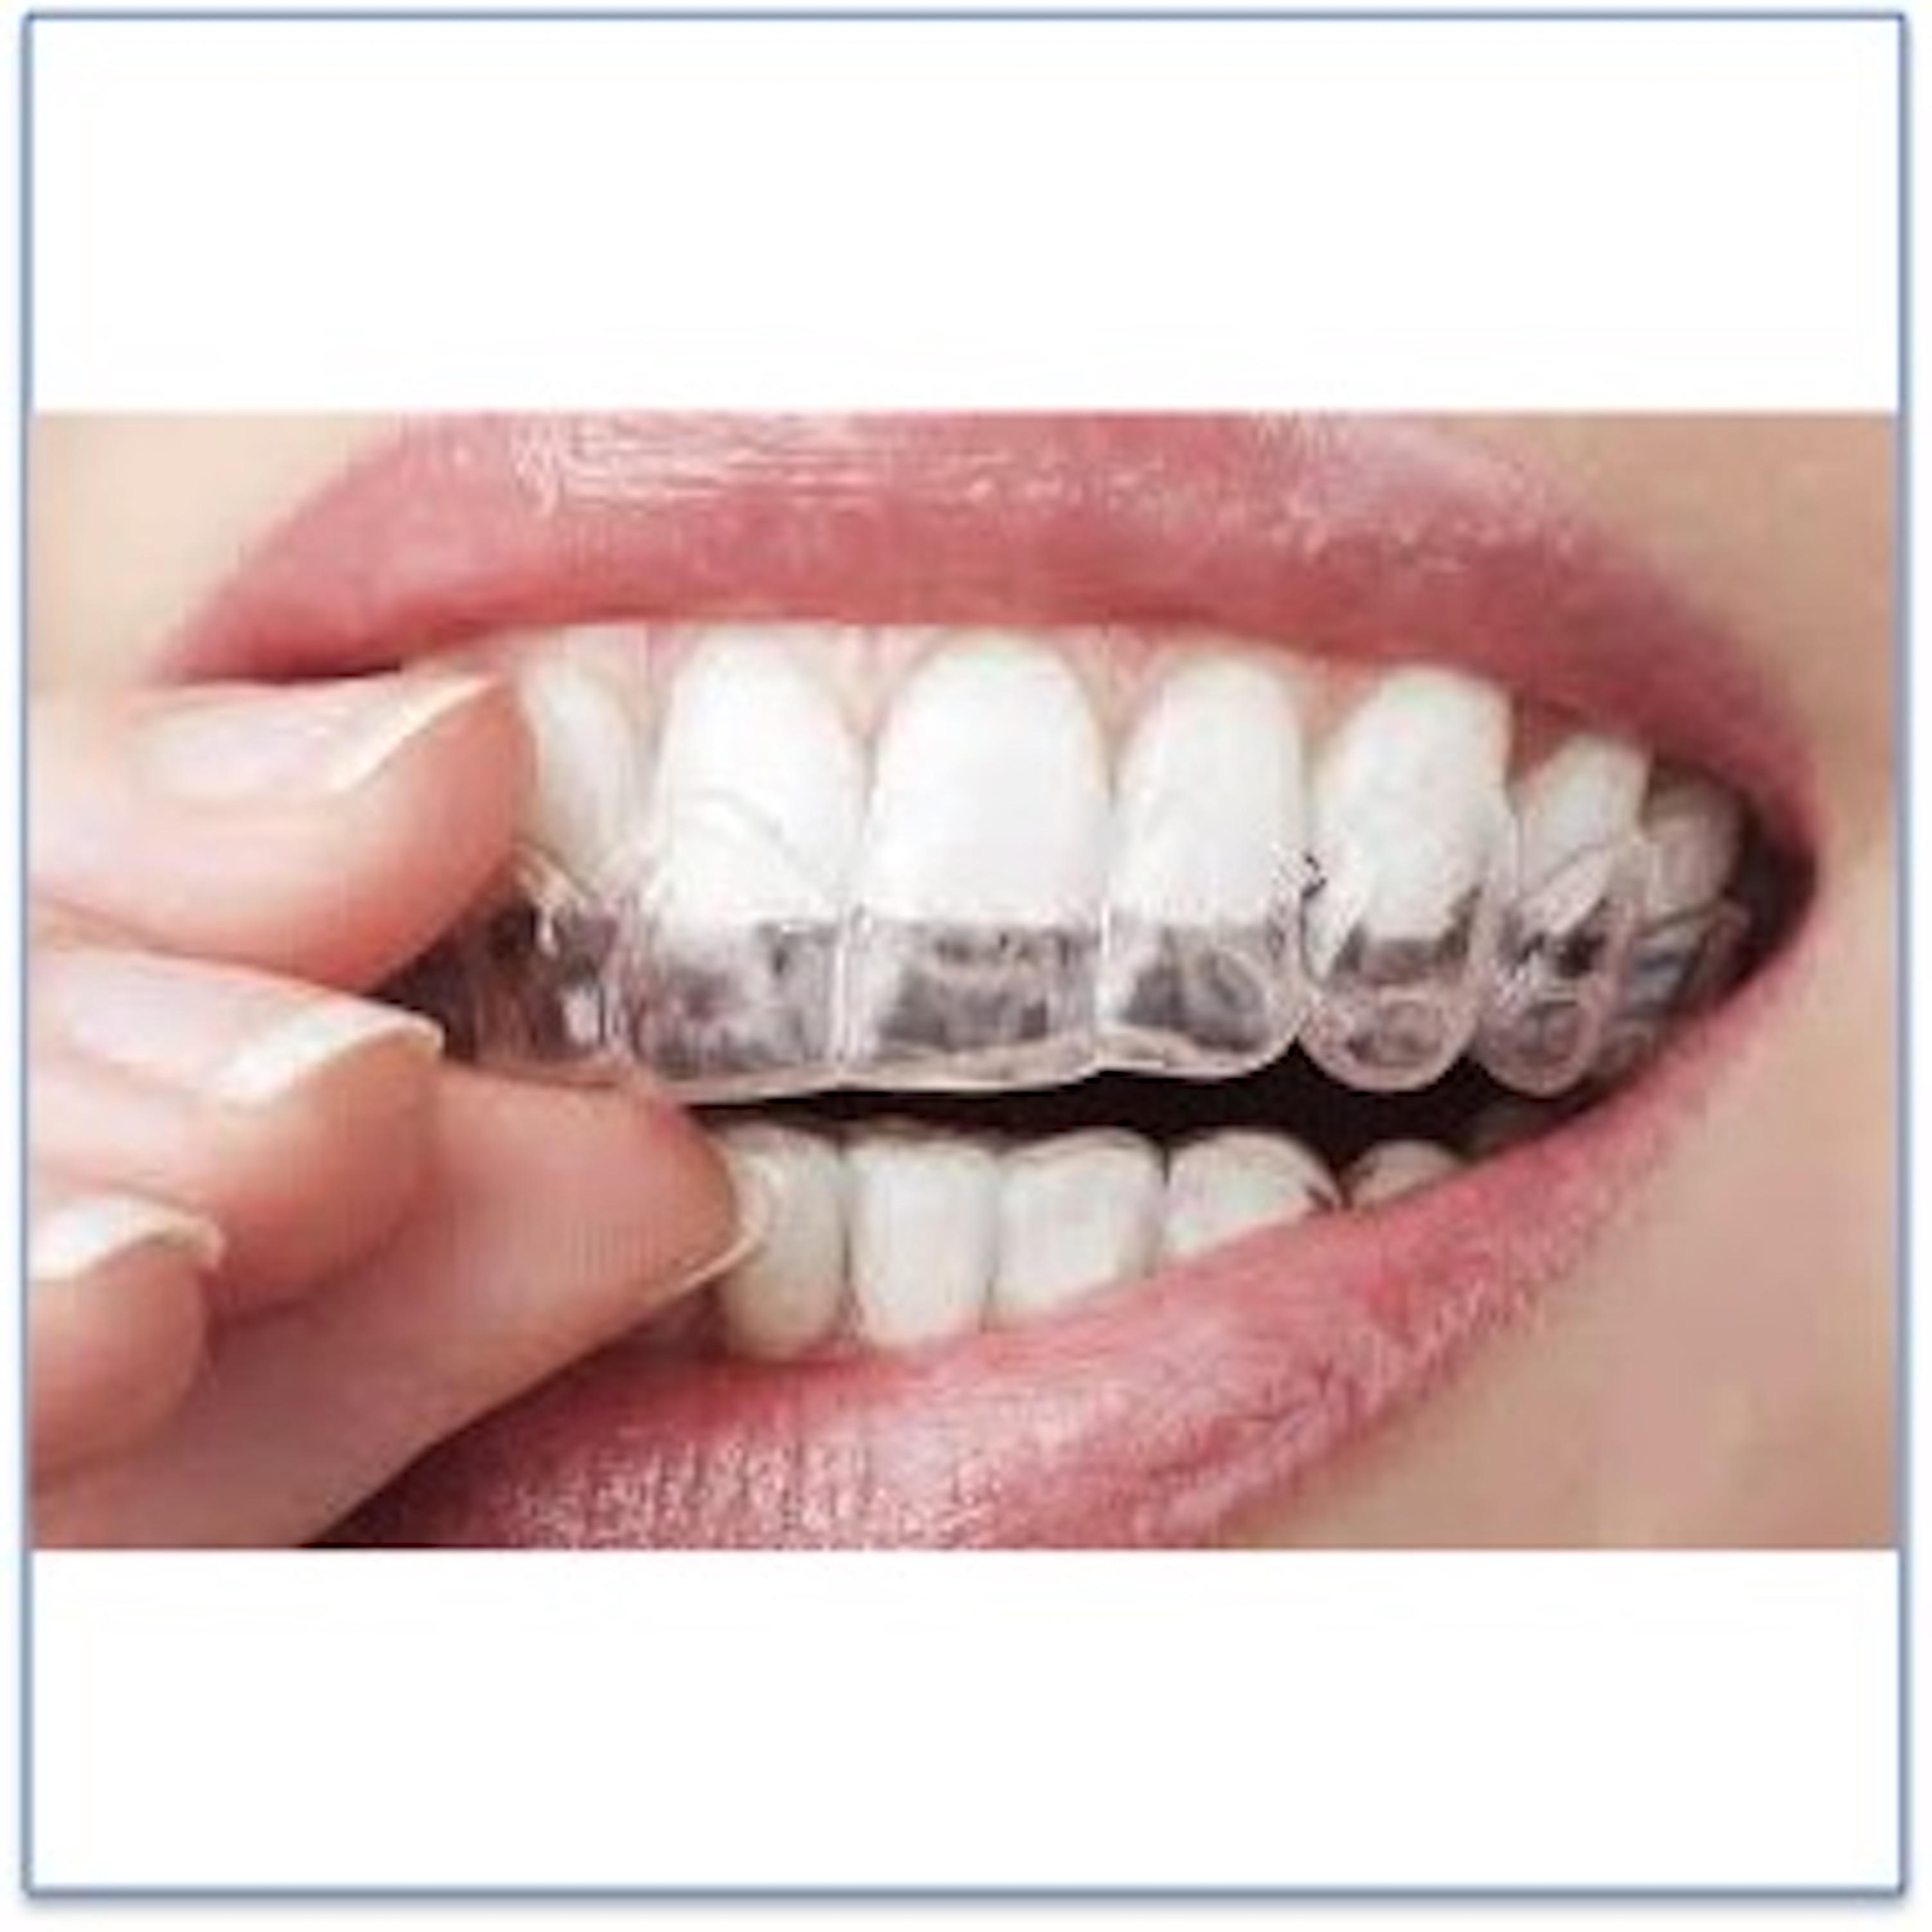 Clareamento Externo Caseiro Pelisser Odontologia